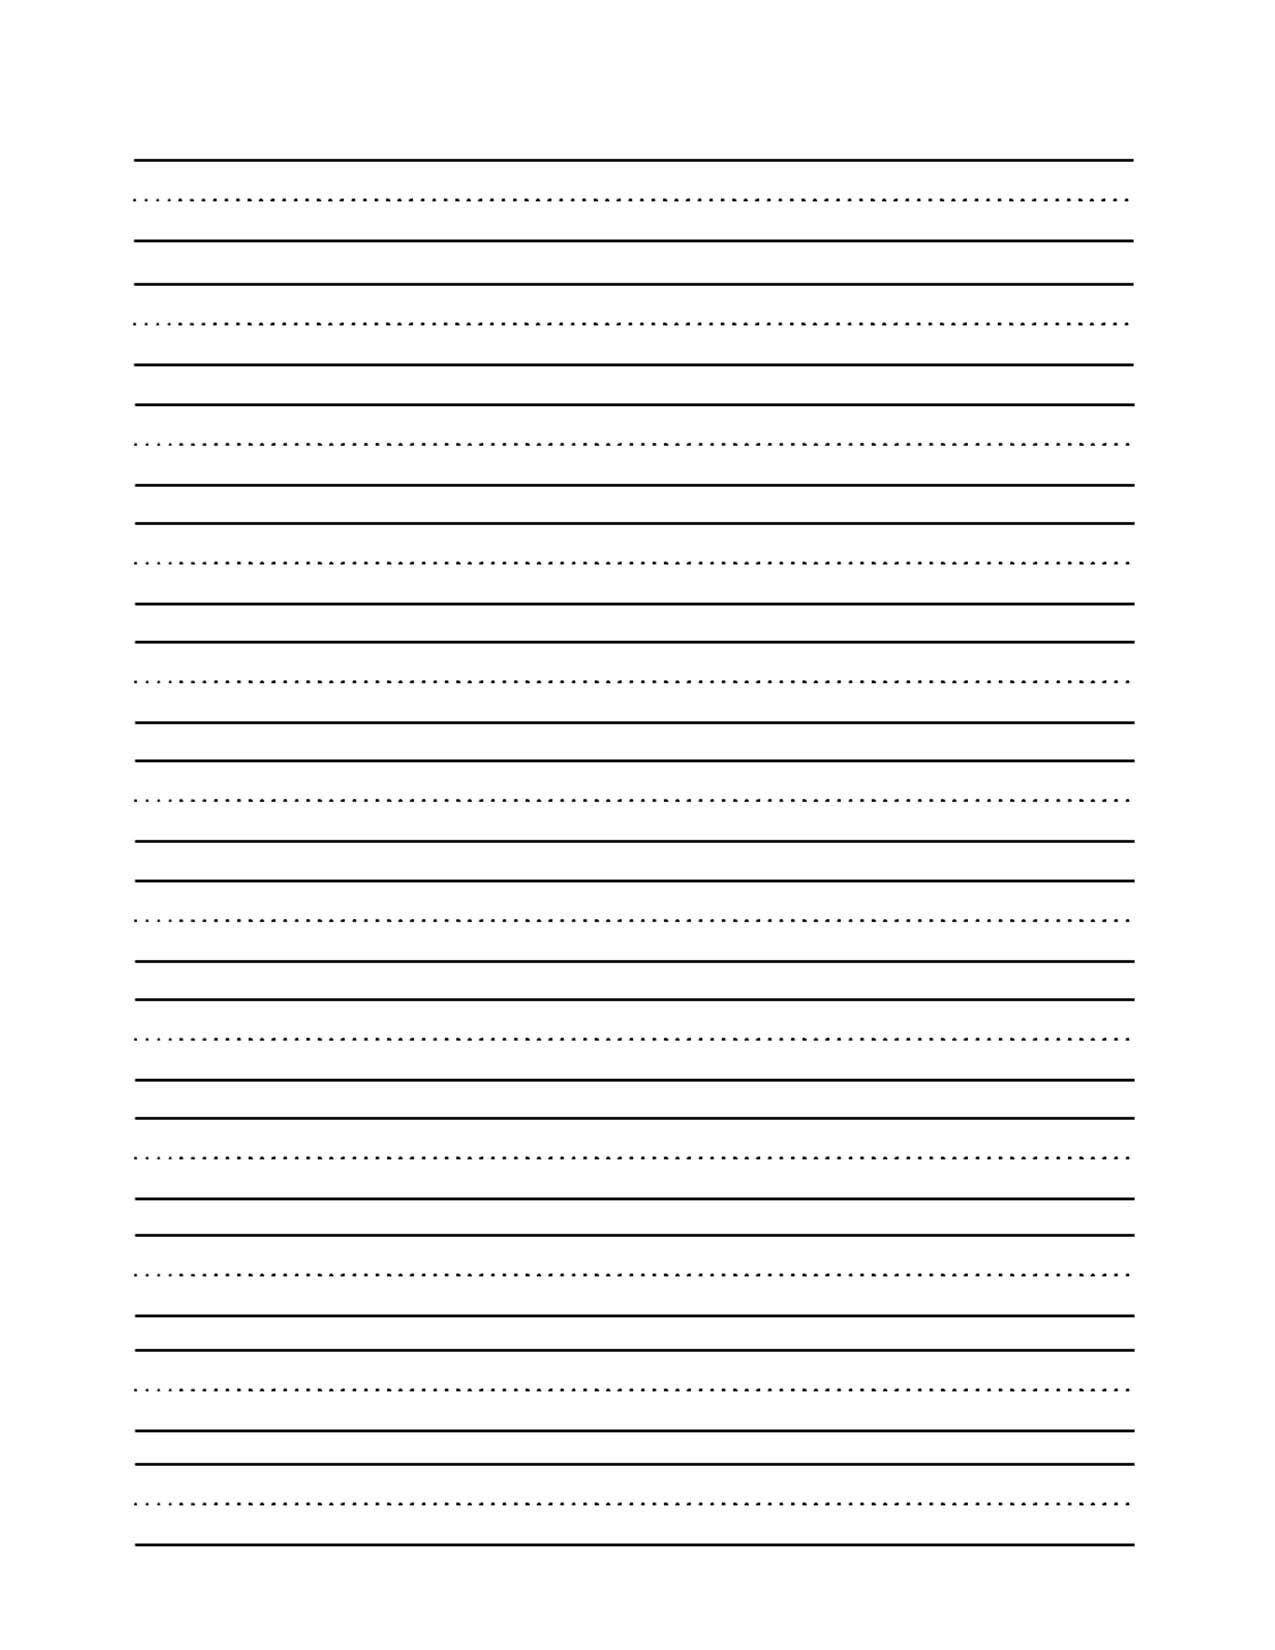 free cursive handwriting paper